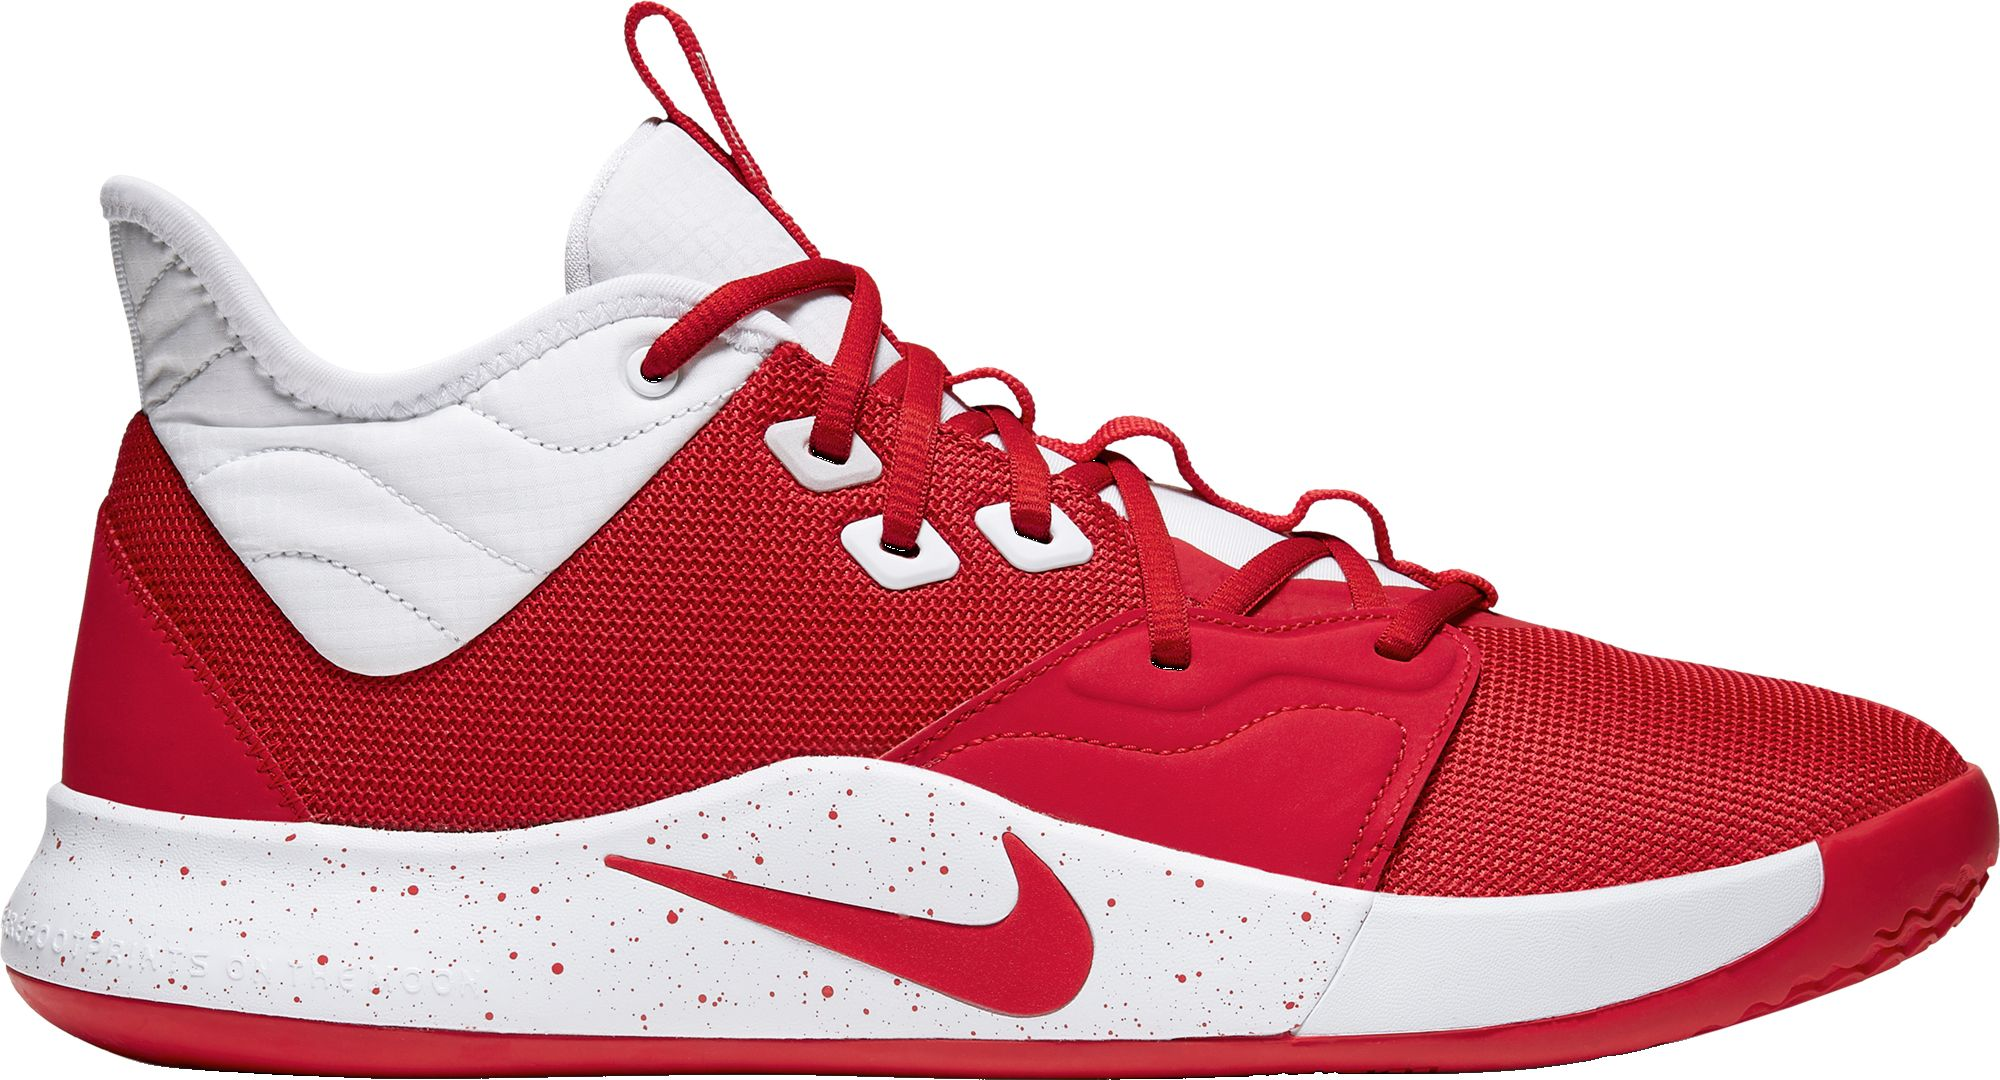 pg3 shoes